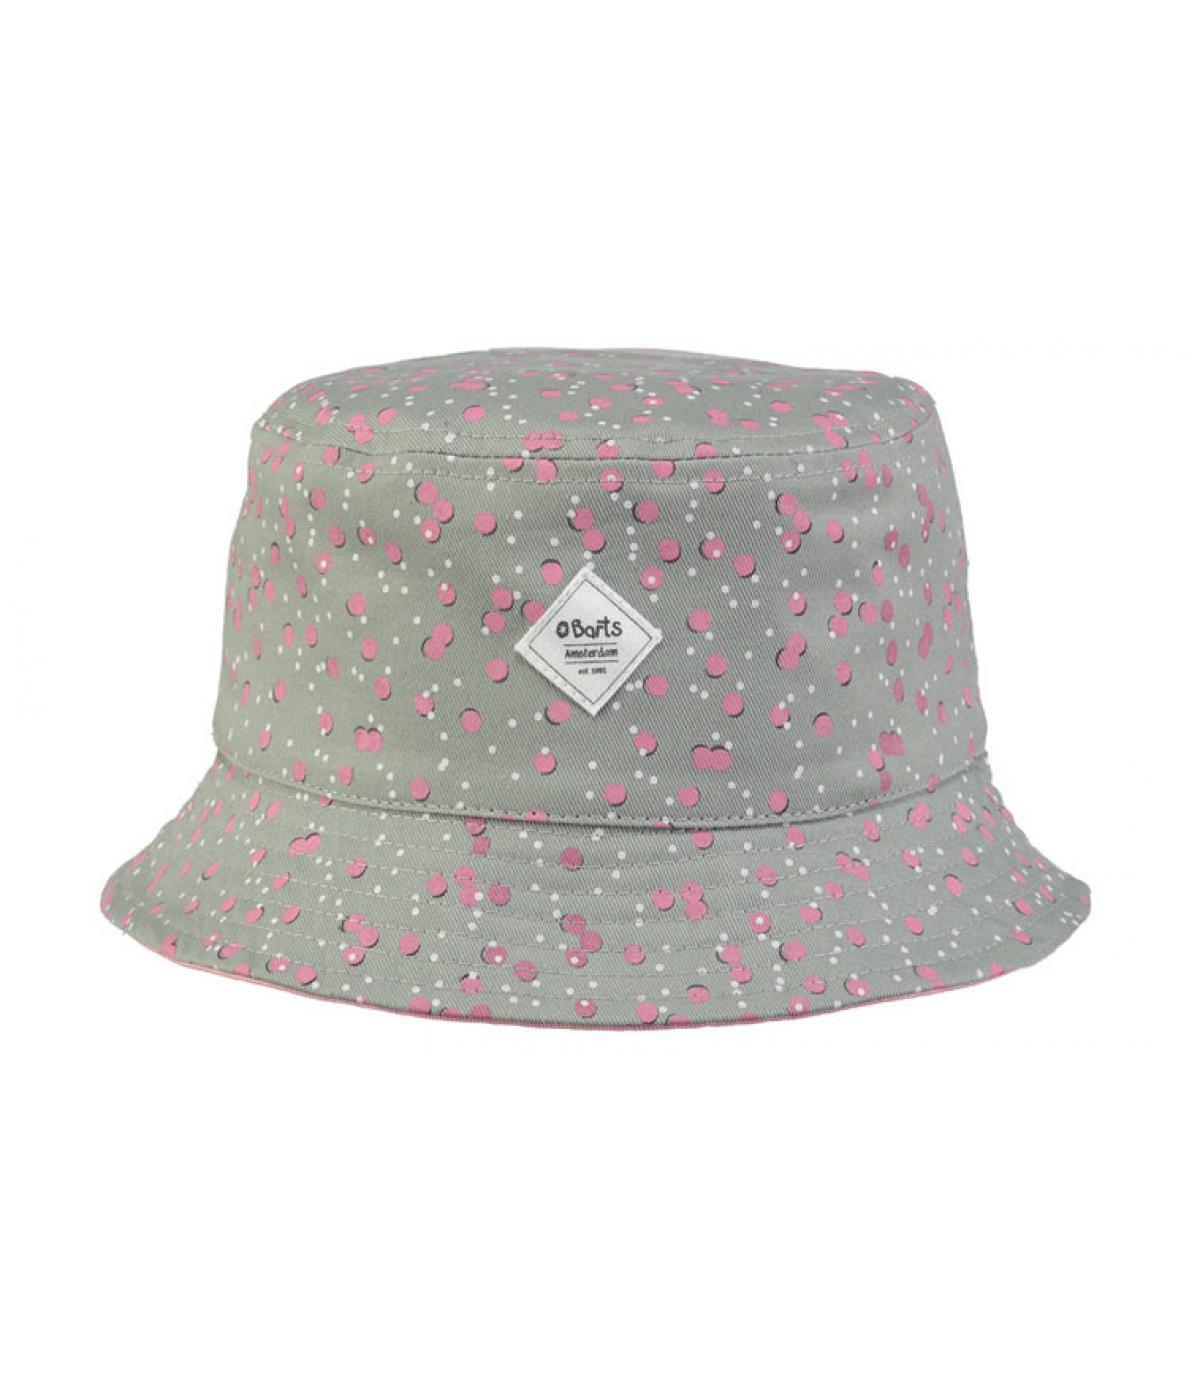 b1e8b32b670 grey pink bucket hat kids - Antiga Hat Kids dark celadon by Barts ...